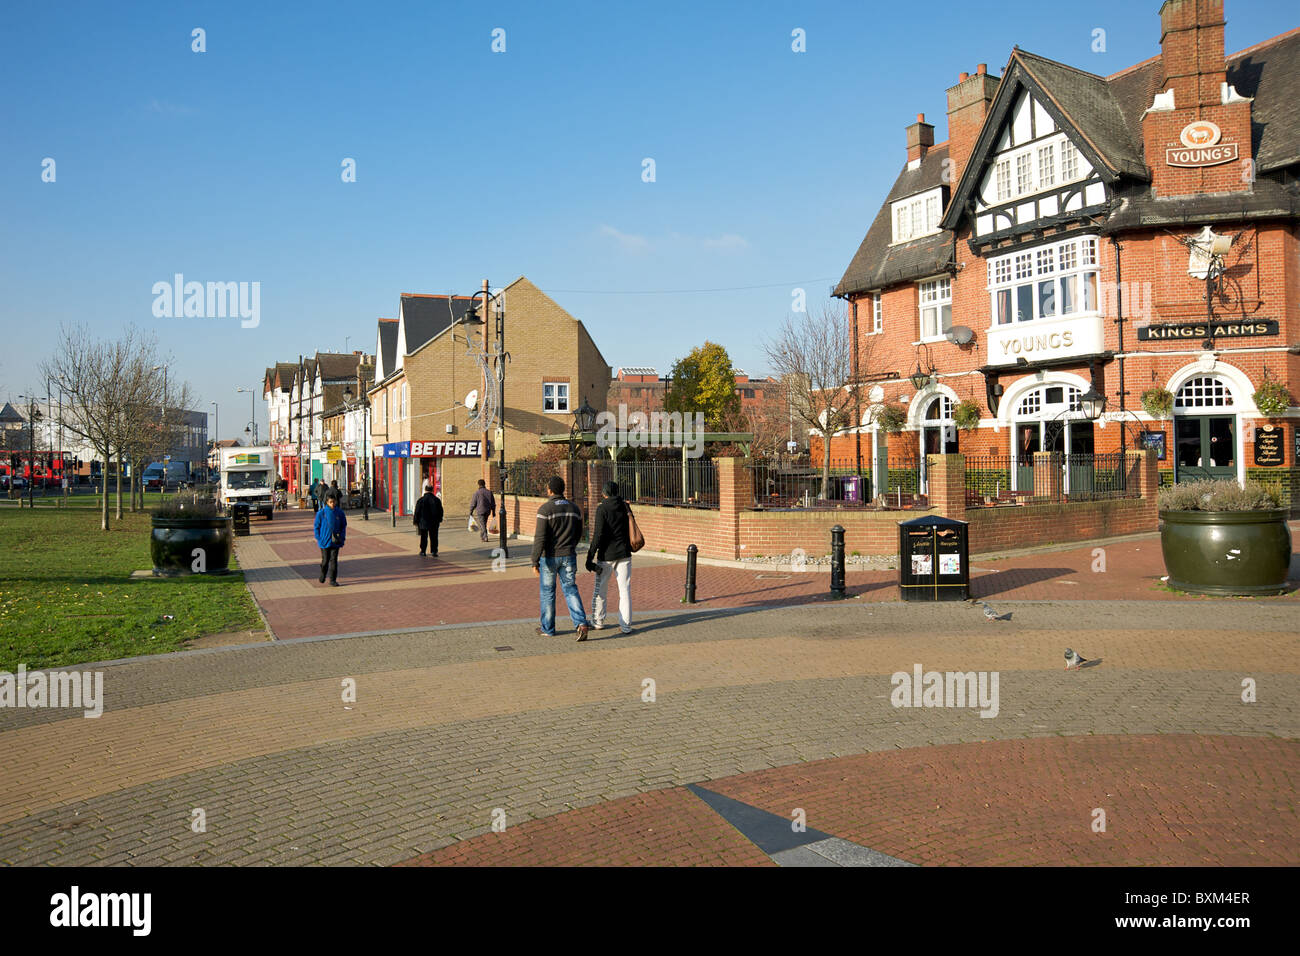 Merton Town